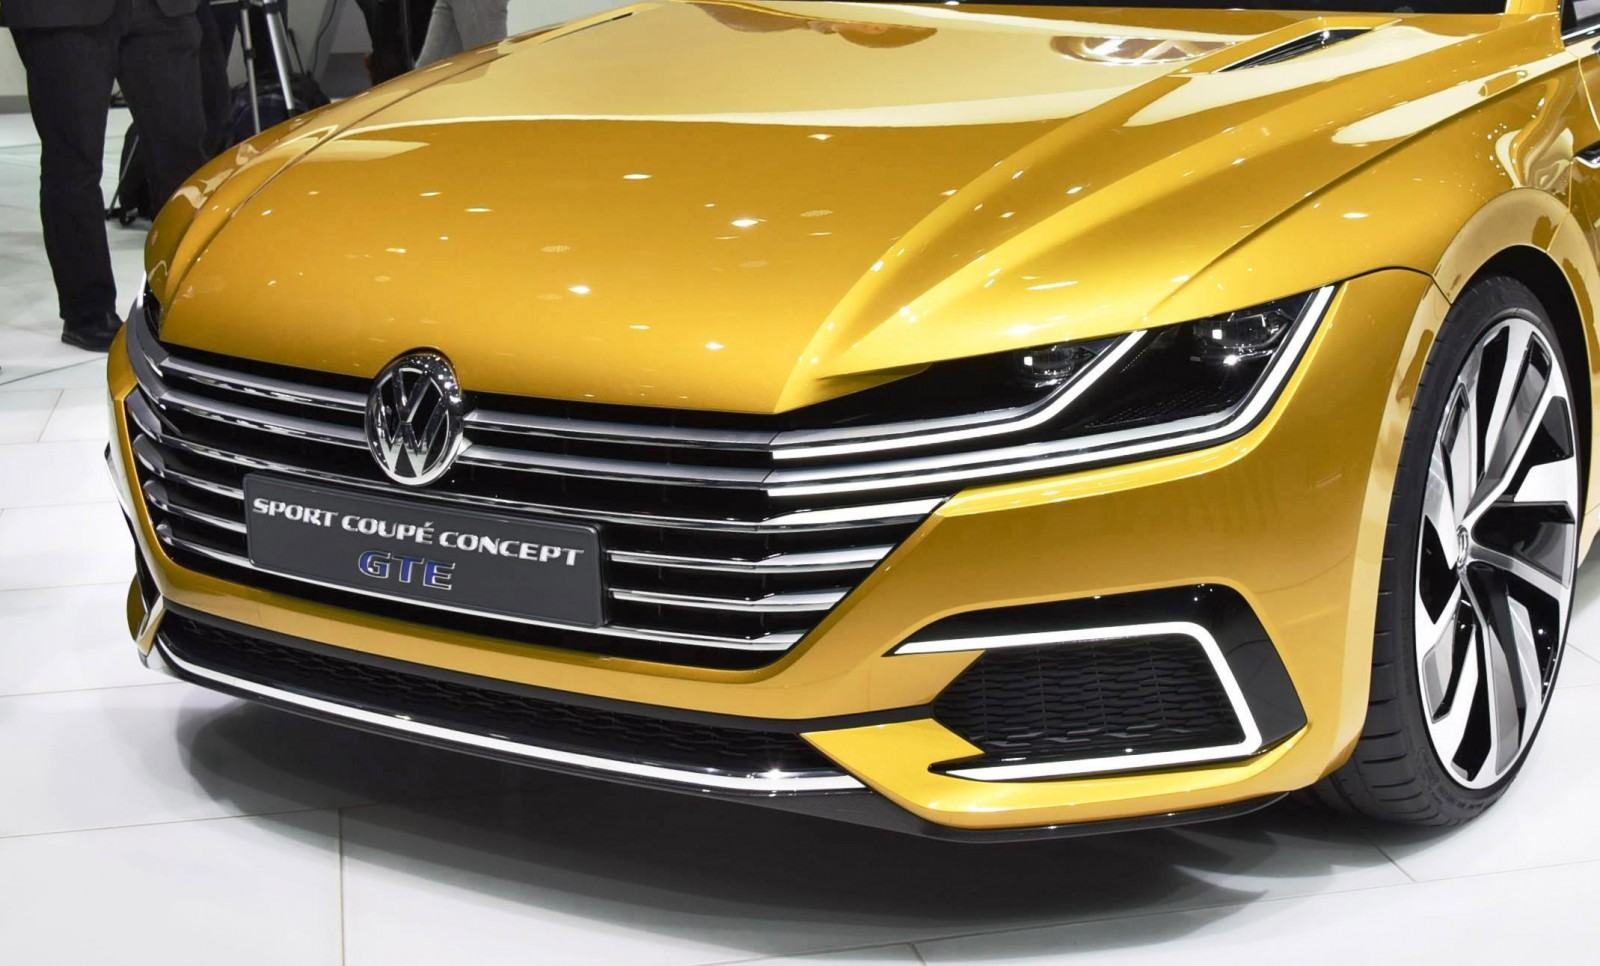 2015-Volkswagen-Sport-Coupe-Concept-GTE-41-1600x966